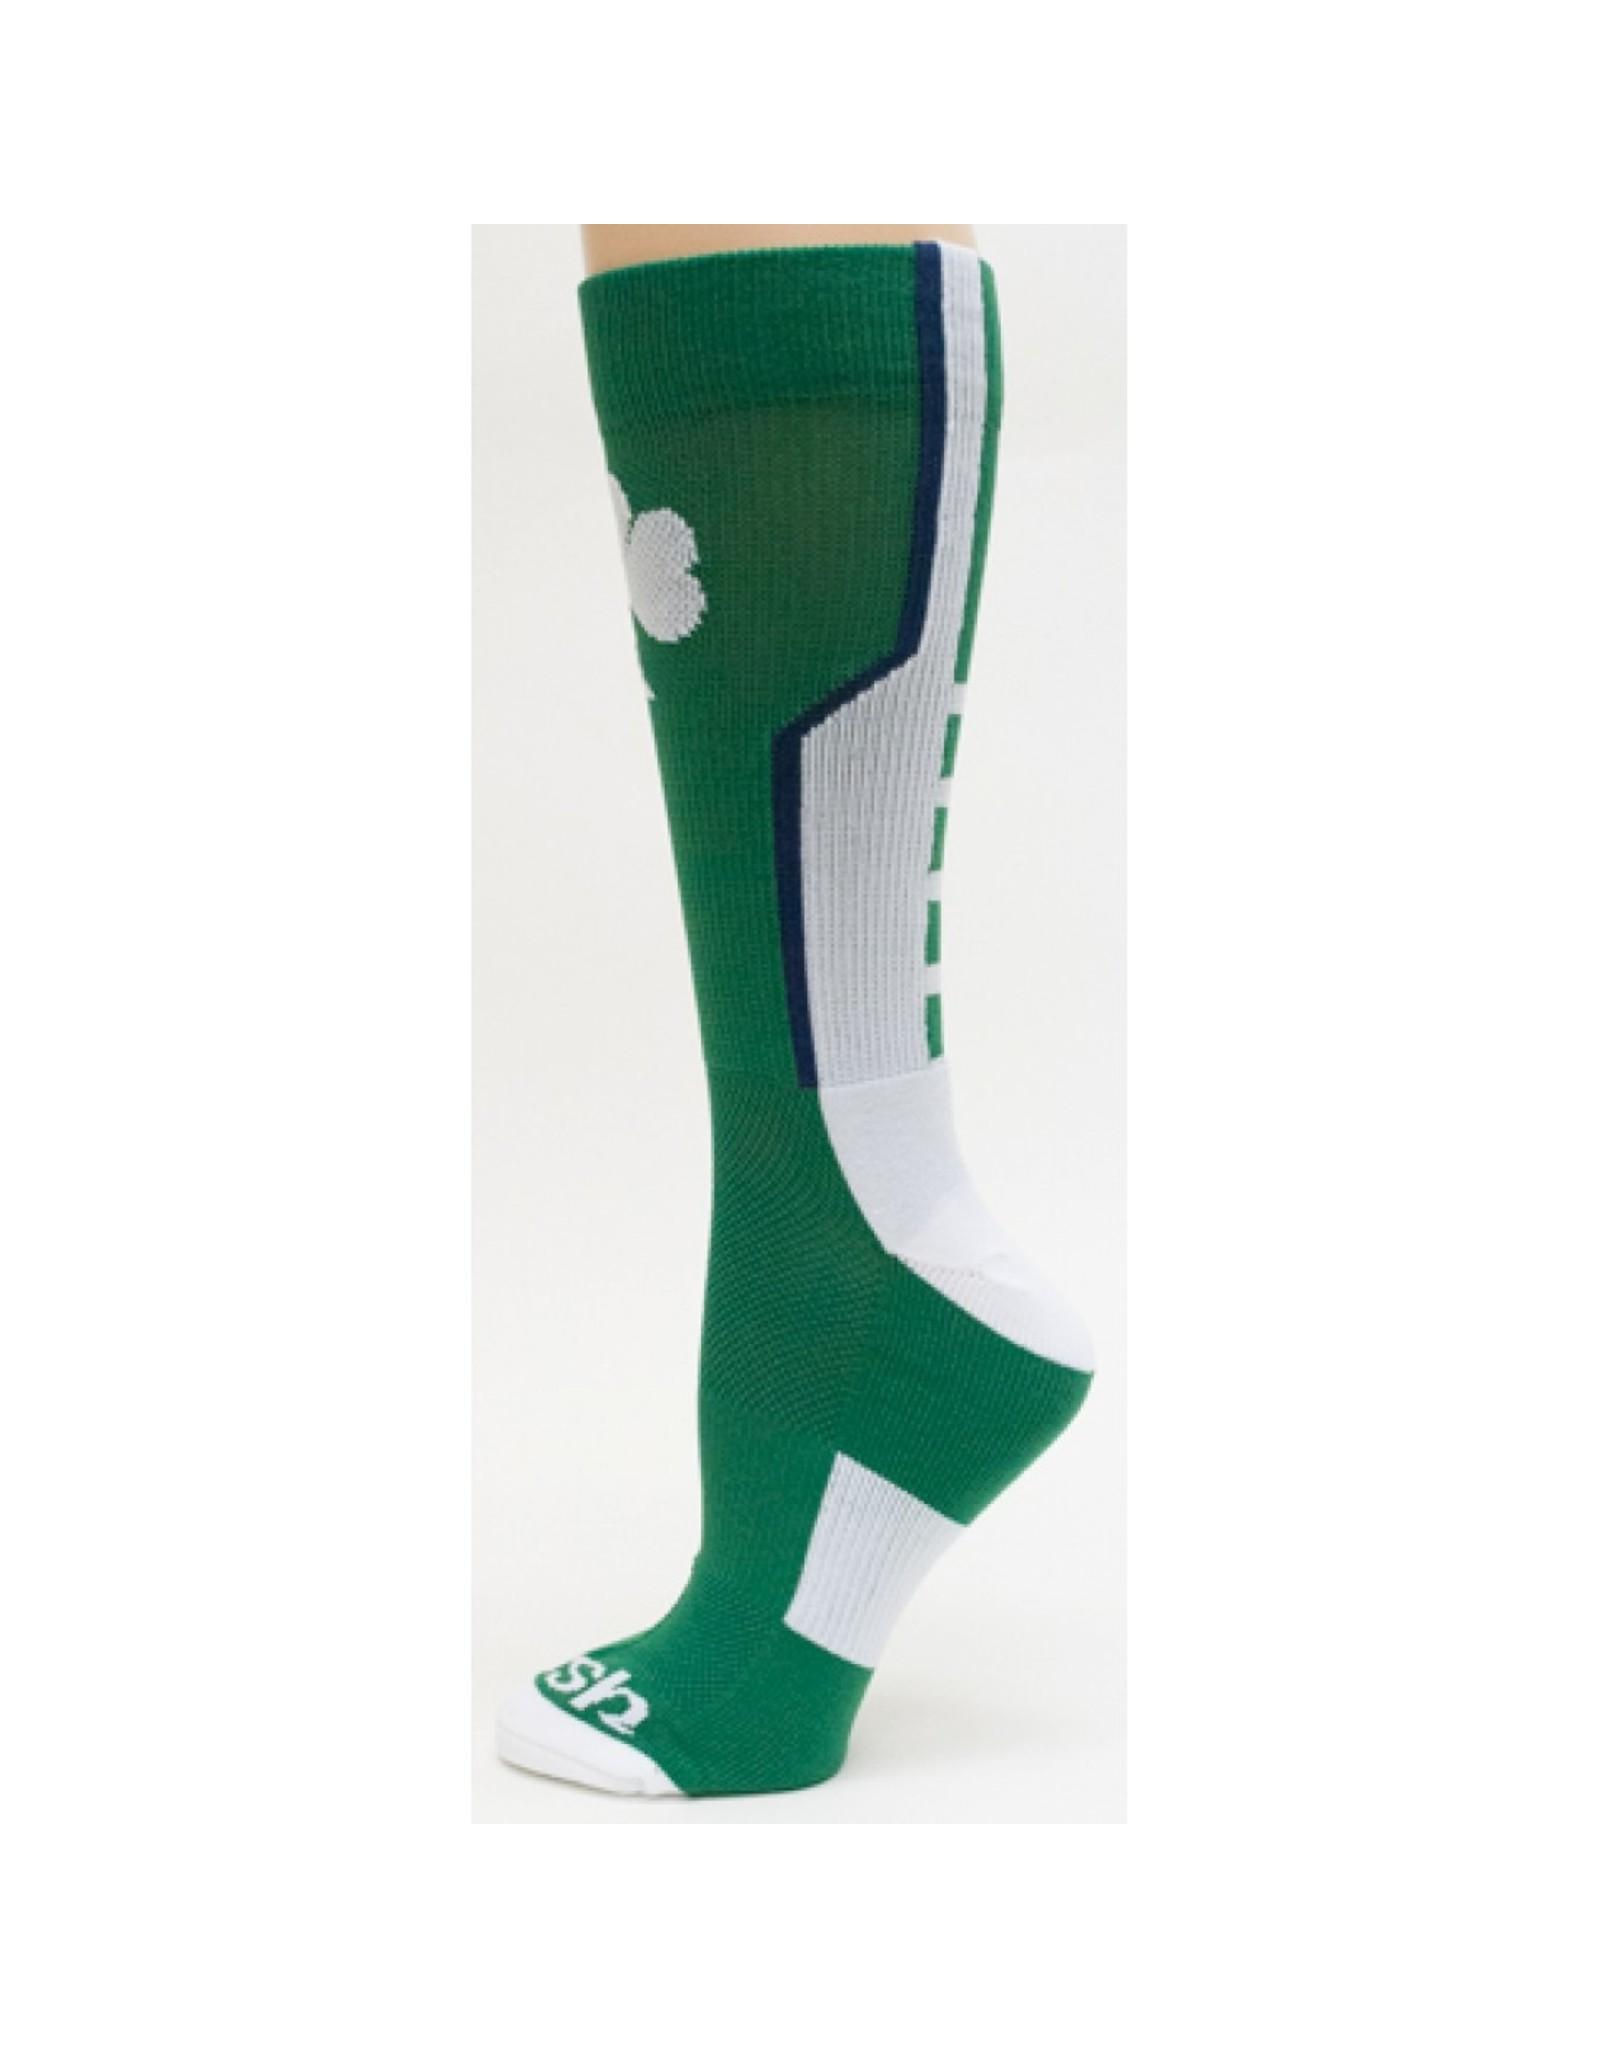 Donegal Bay Irish Performance Socks